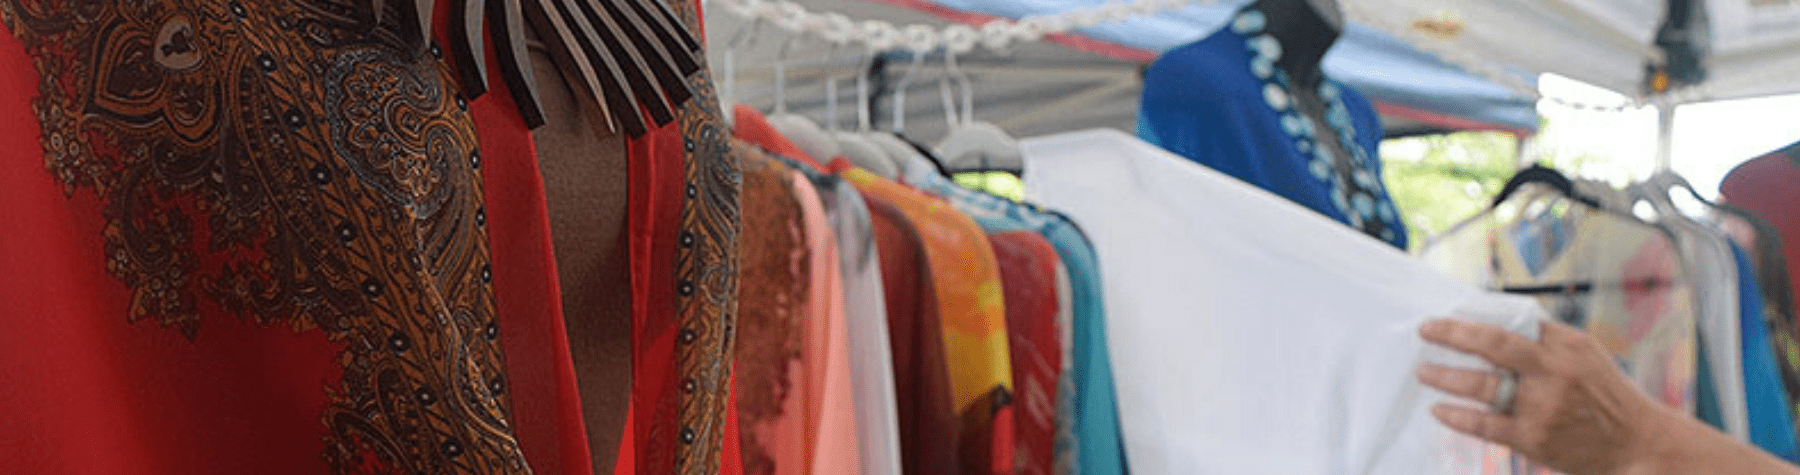 Staged re-open date set for Port Douglas Markets